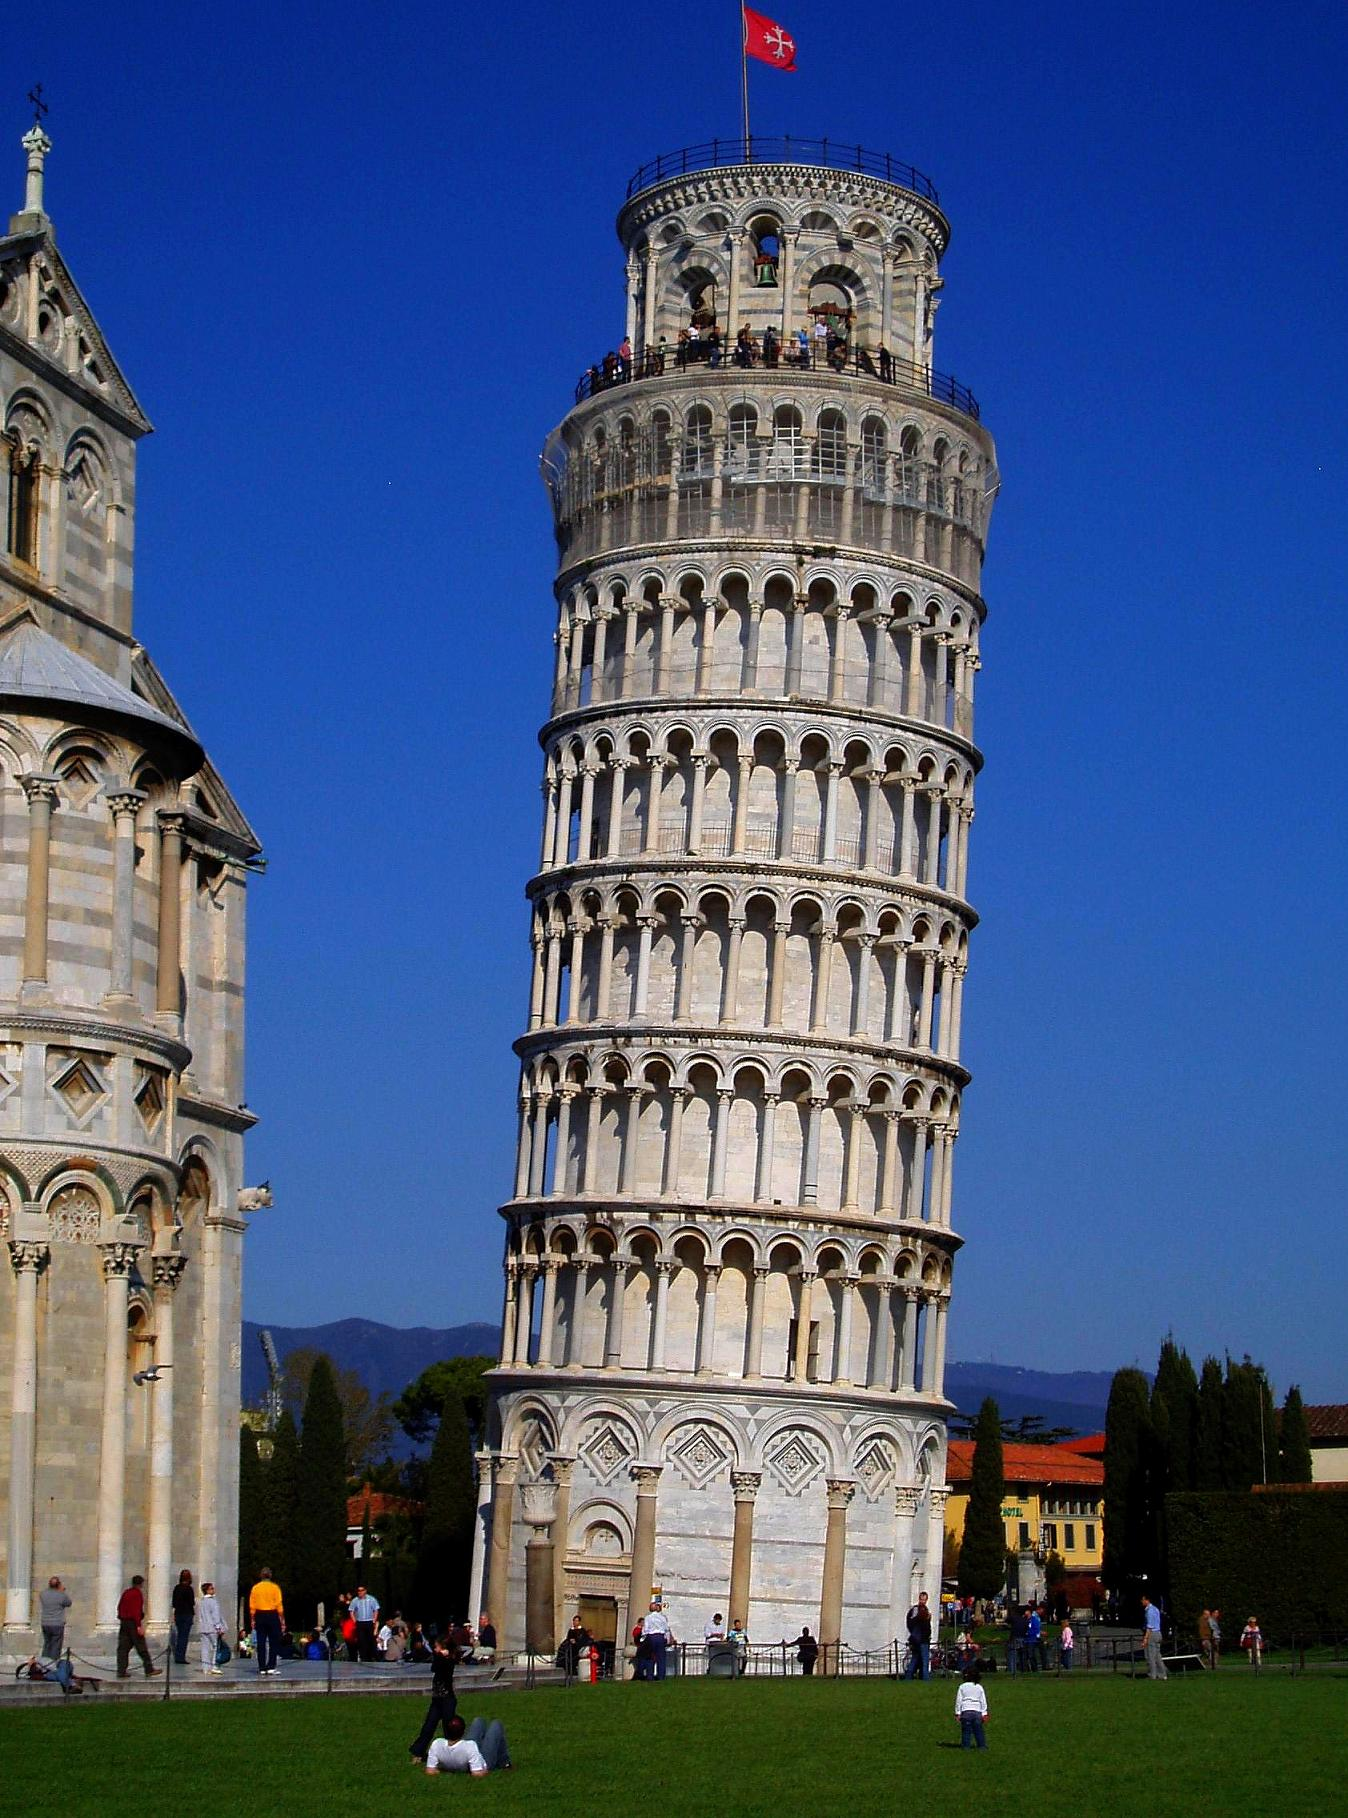 tower of pisa beautiful view